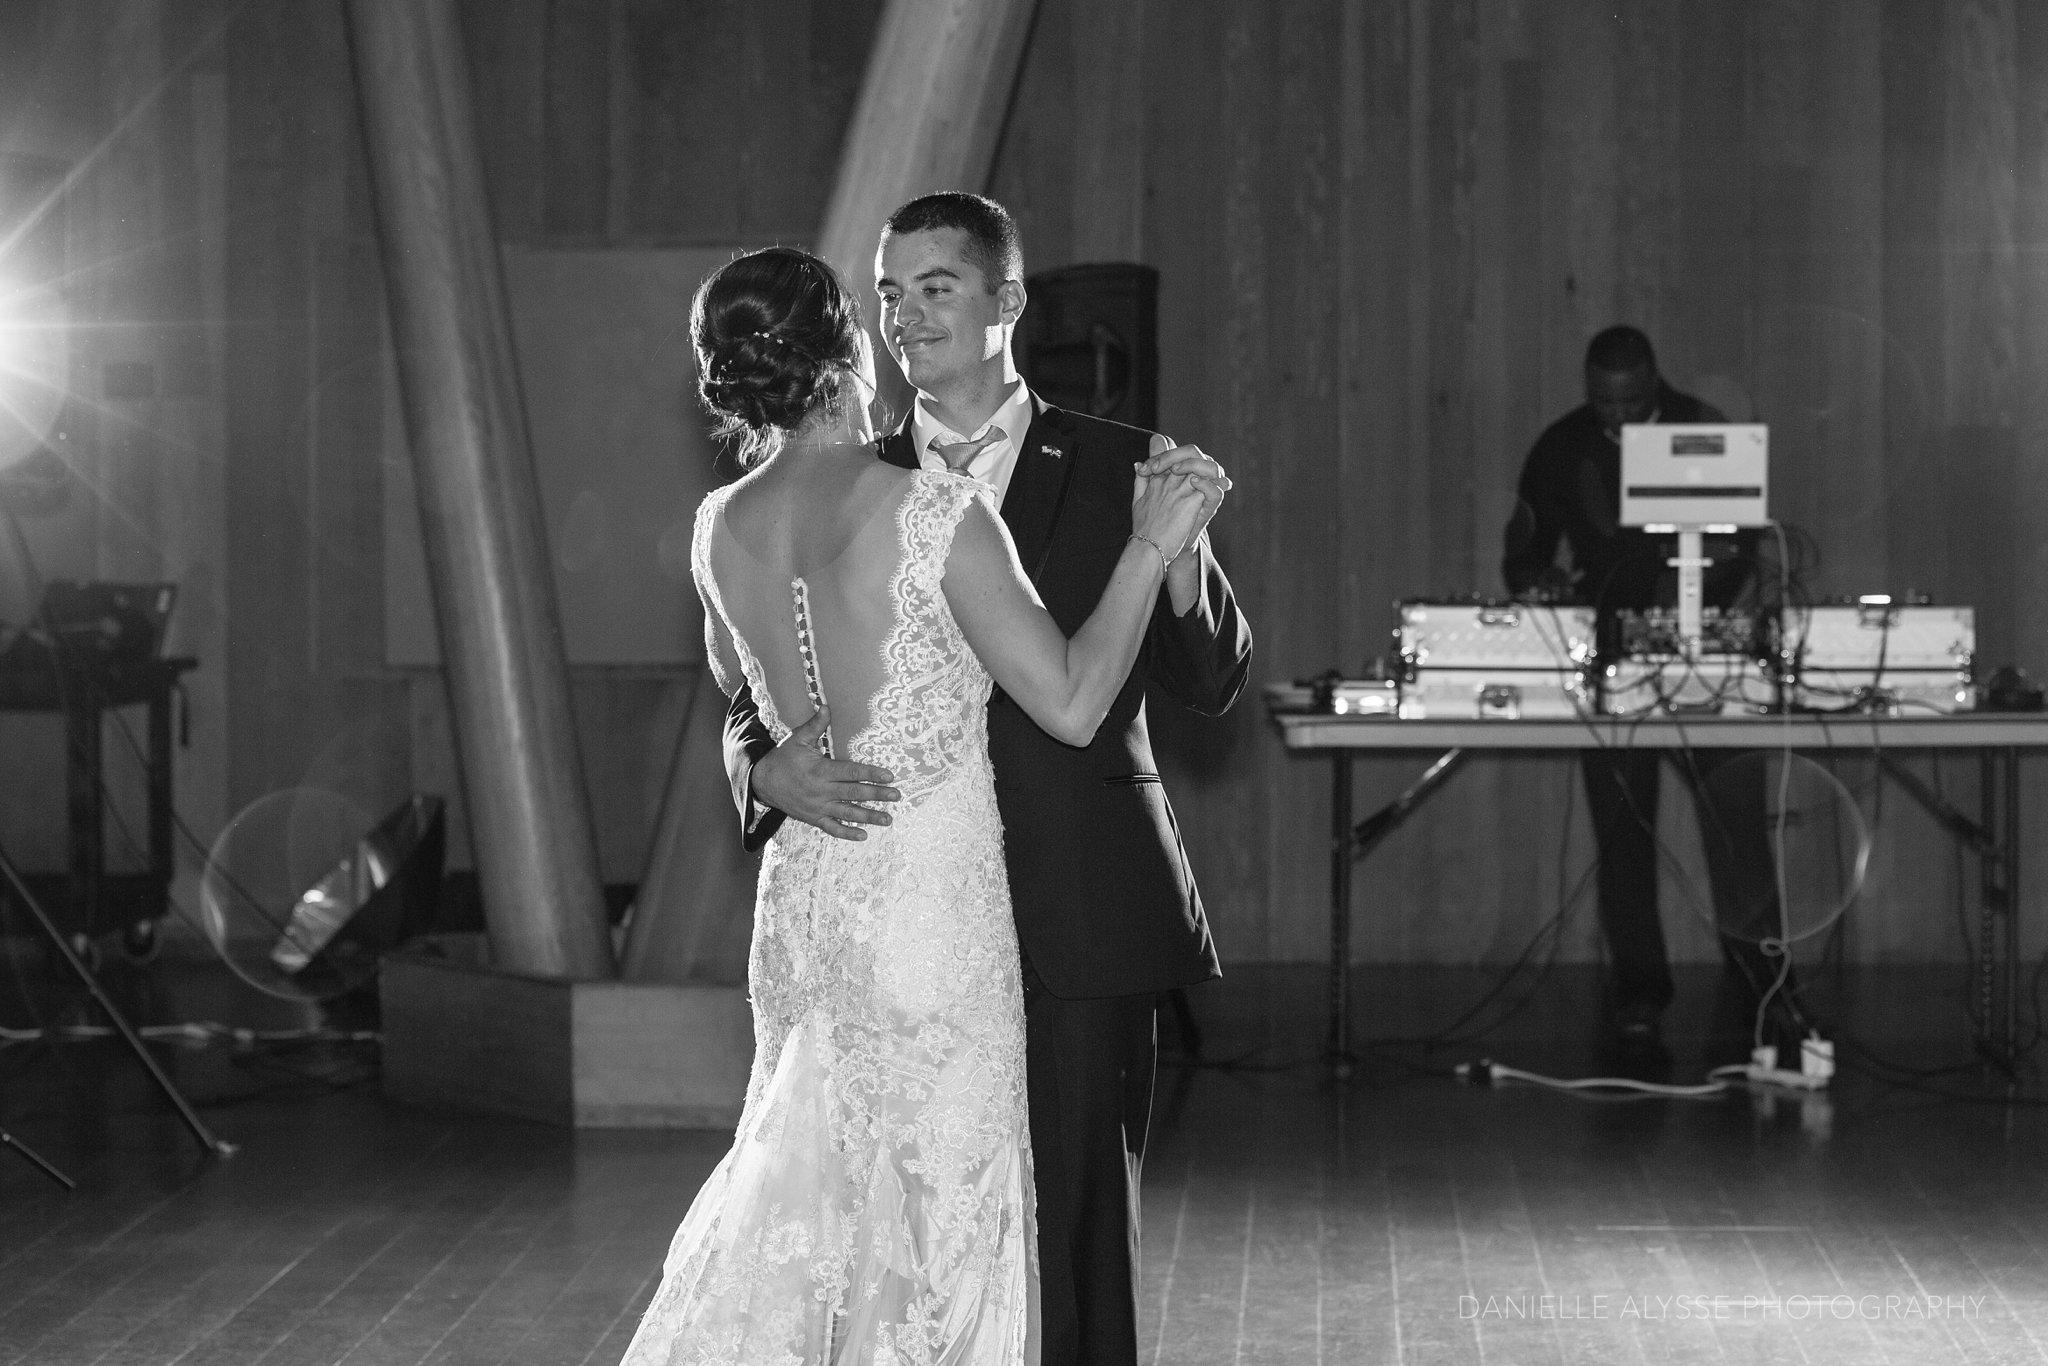 170429_blog_kimberly_ben_wedding_san_mateo_curiodyssey_danielle_alysse_photography_sacramento_photographer0790_WEB.jpg